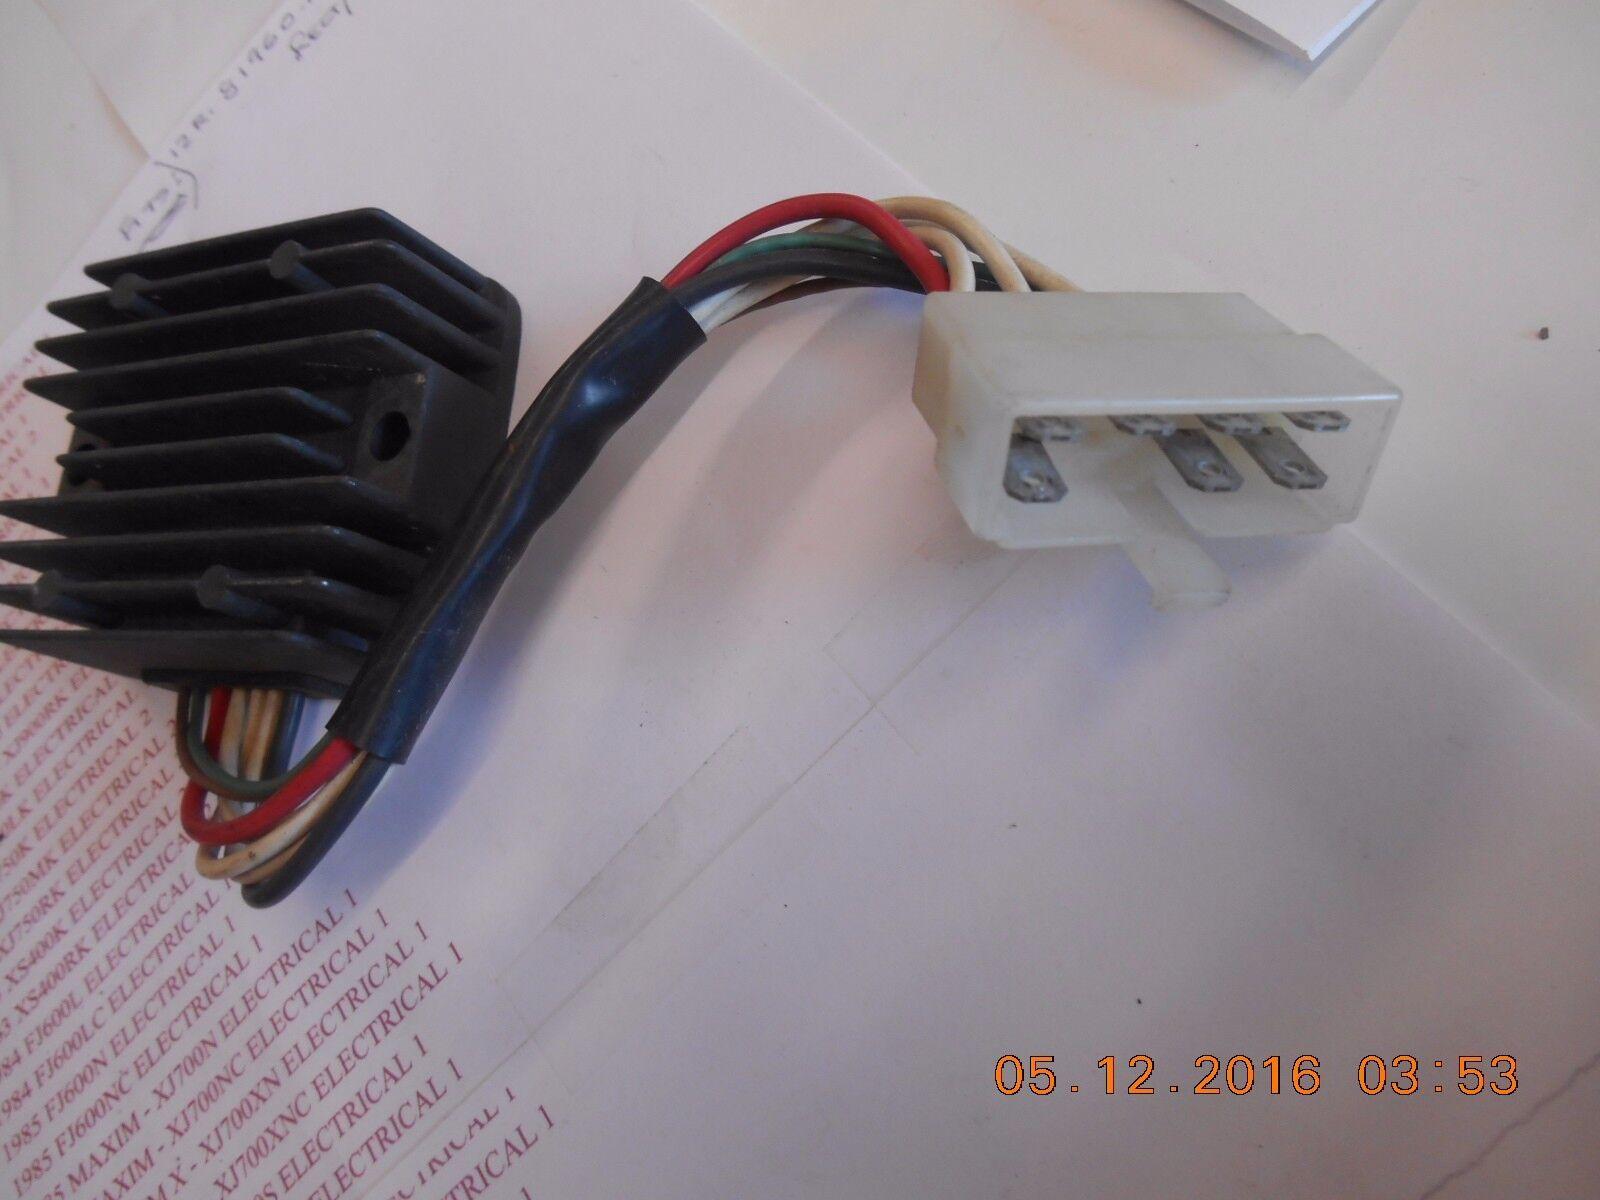 1981 Yamaha Xj650 Jx 650 Maxim Oem Rectifier Regulator Voltage Unit Wiring Ignition Ebay